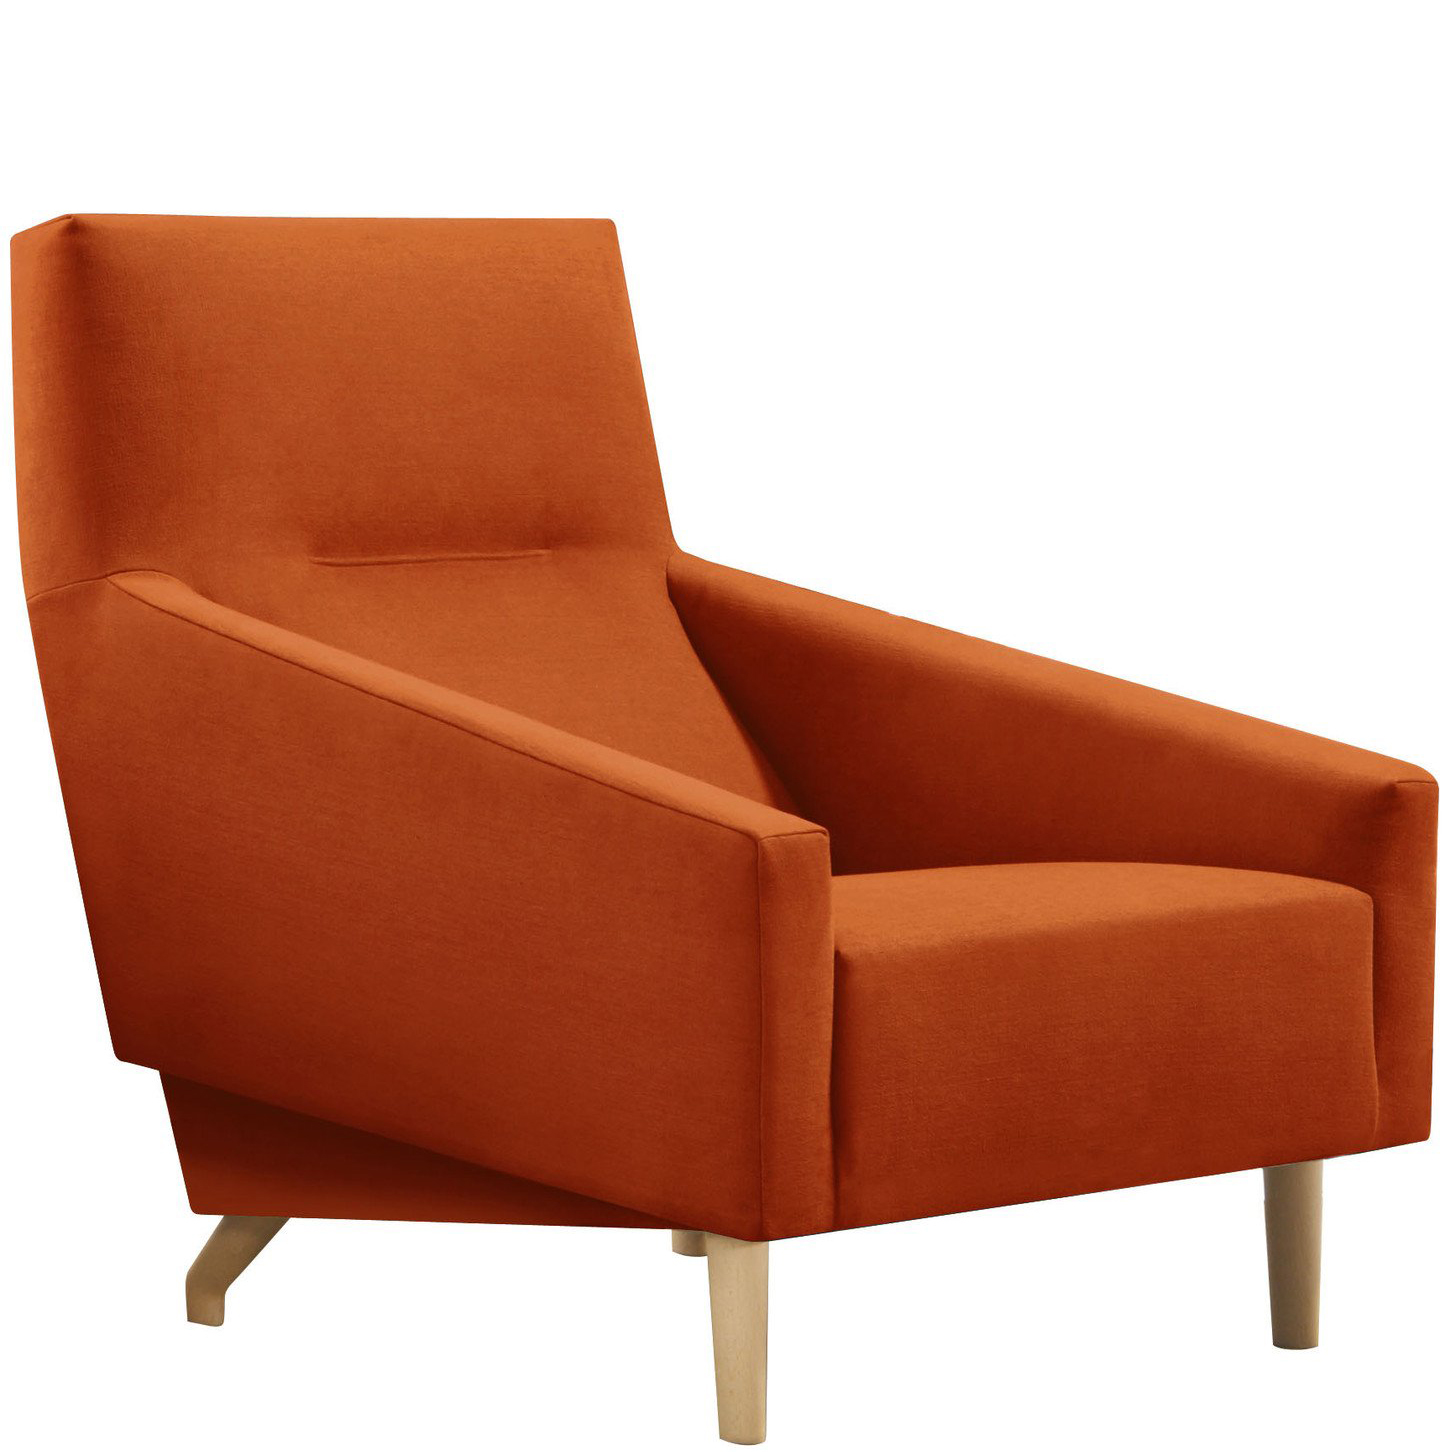 Orange hotel lounge chair